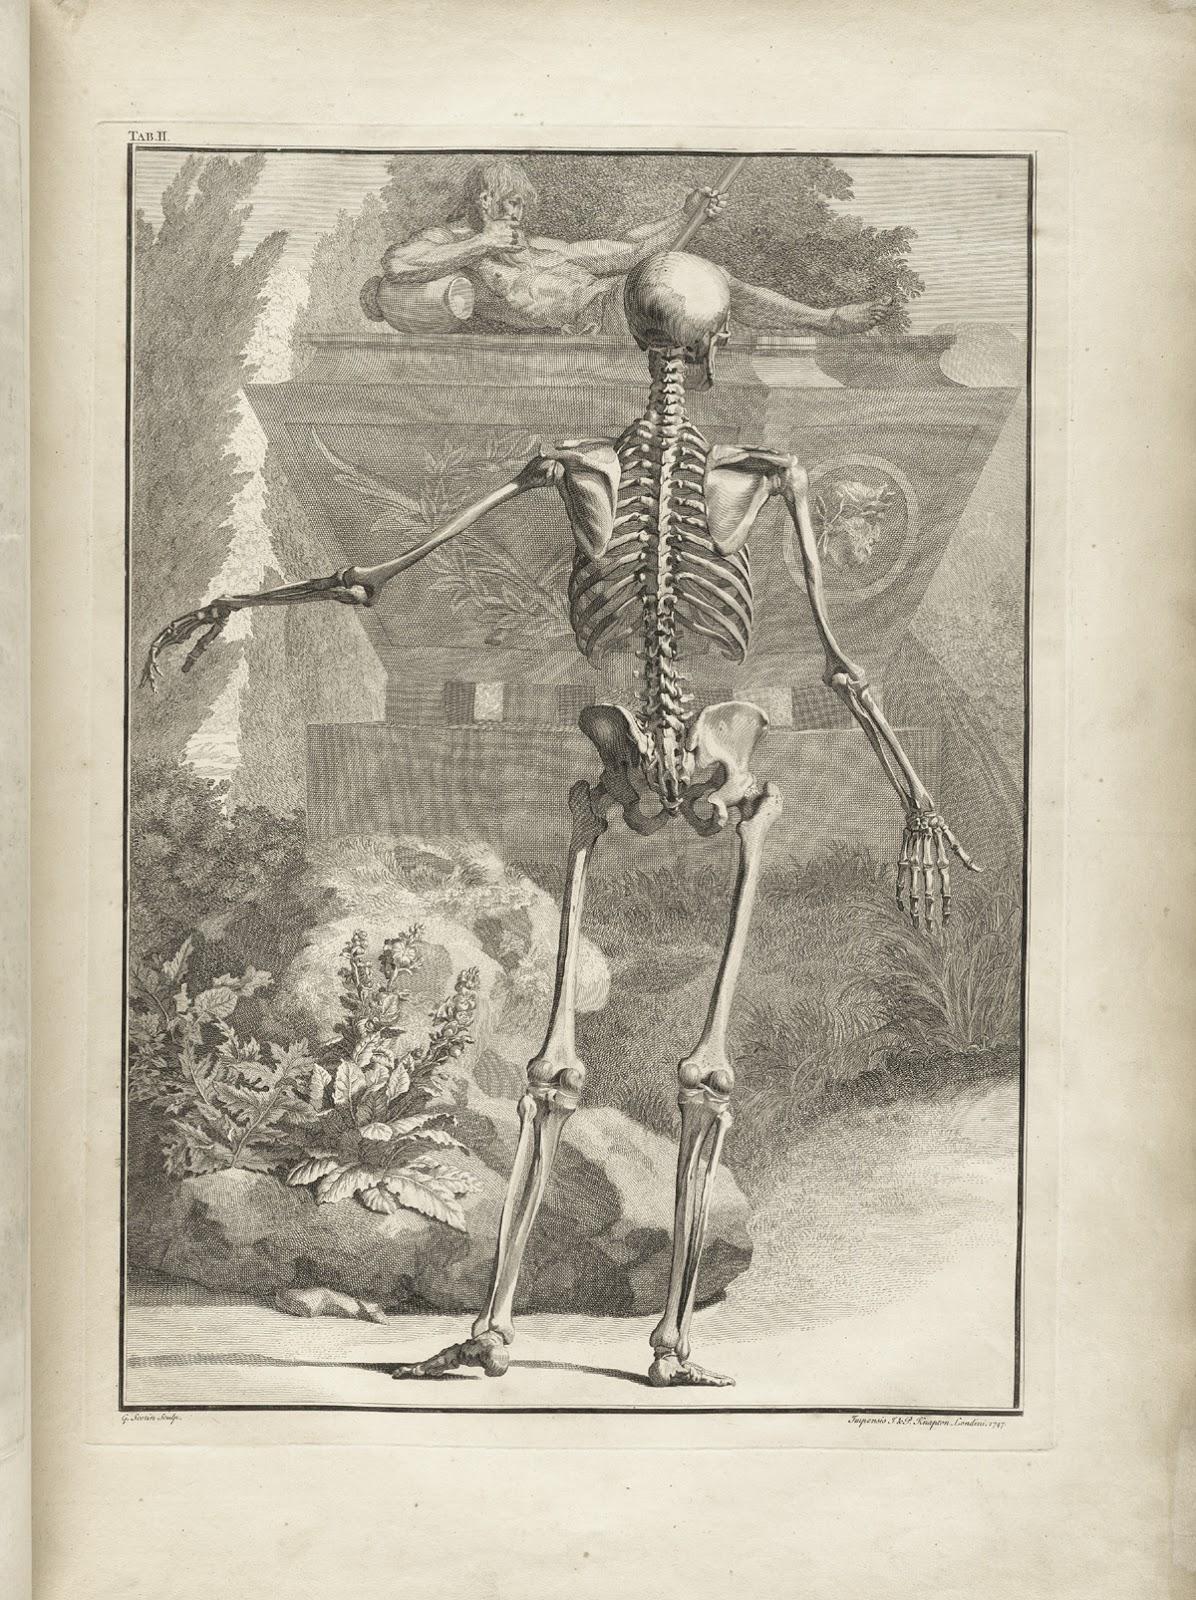 4thYearProject: Bernhard Siegfried Albinus on human anatomy